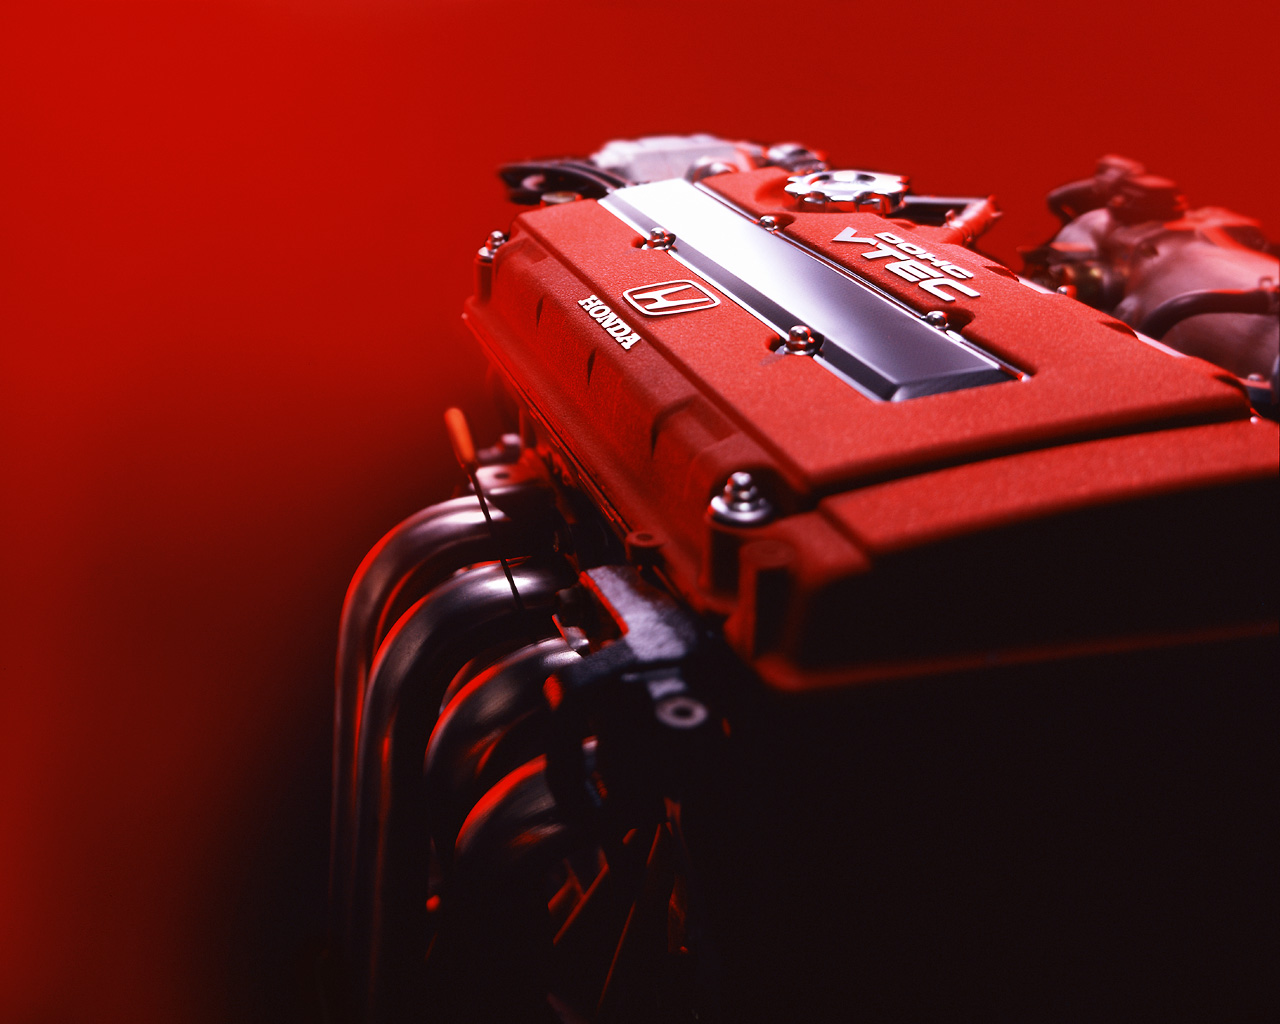 Honda | originaldougal